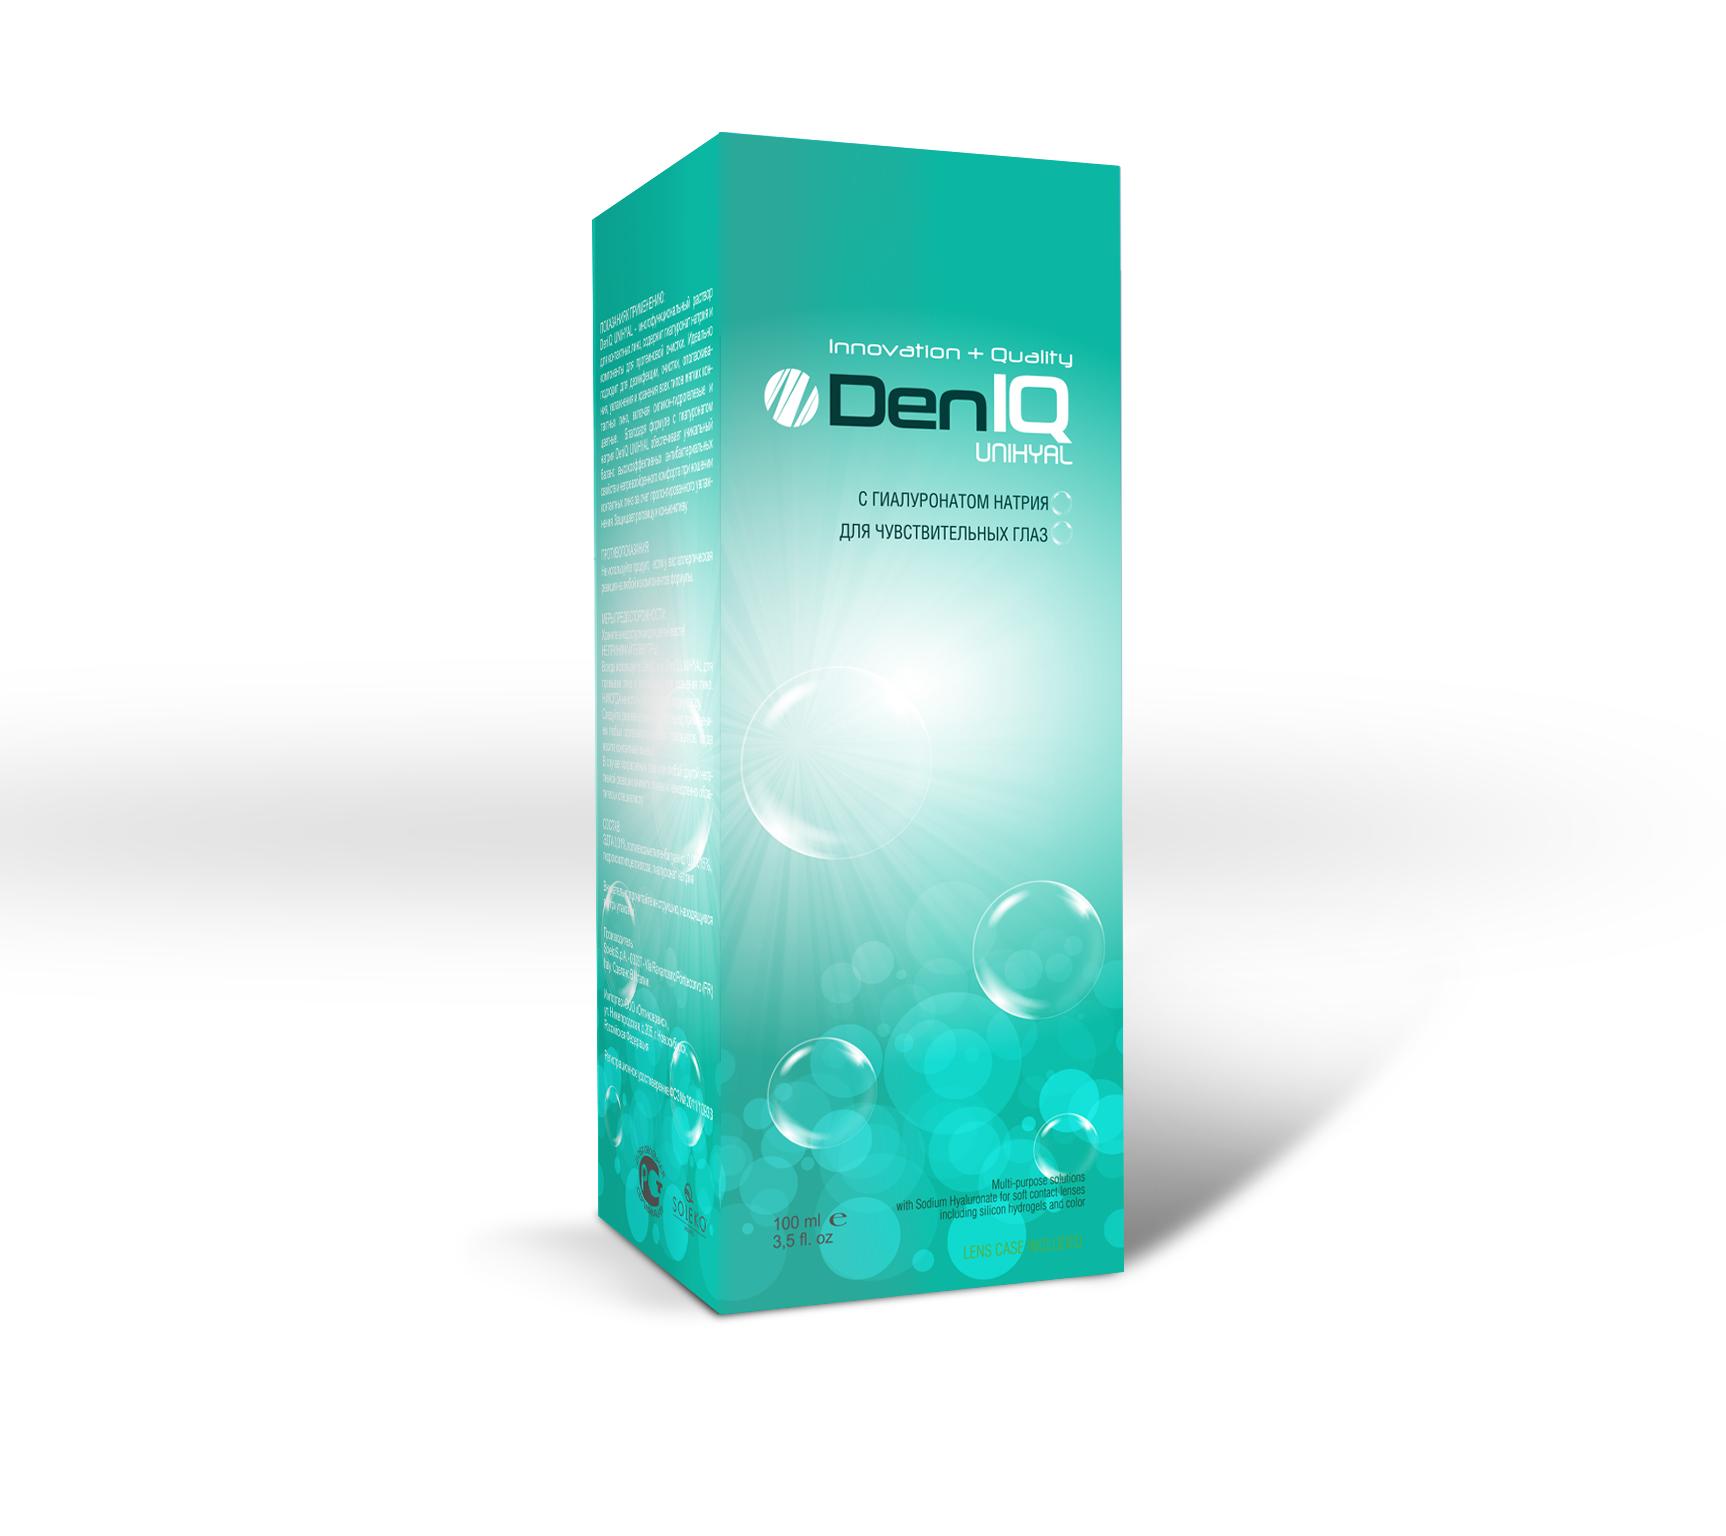 Конкурс на разработку дизайна упаковки фото f_504452cb974c0.jpg